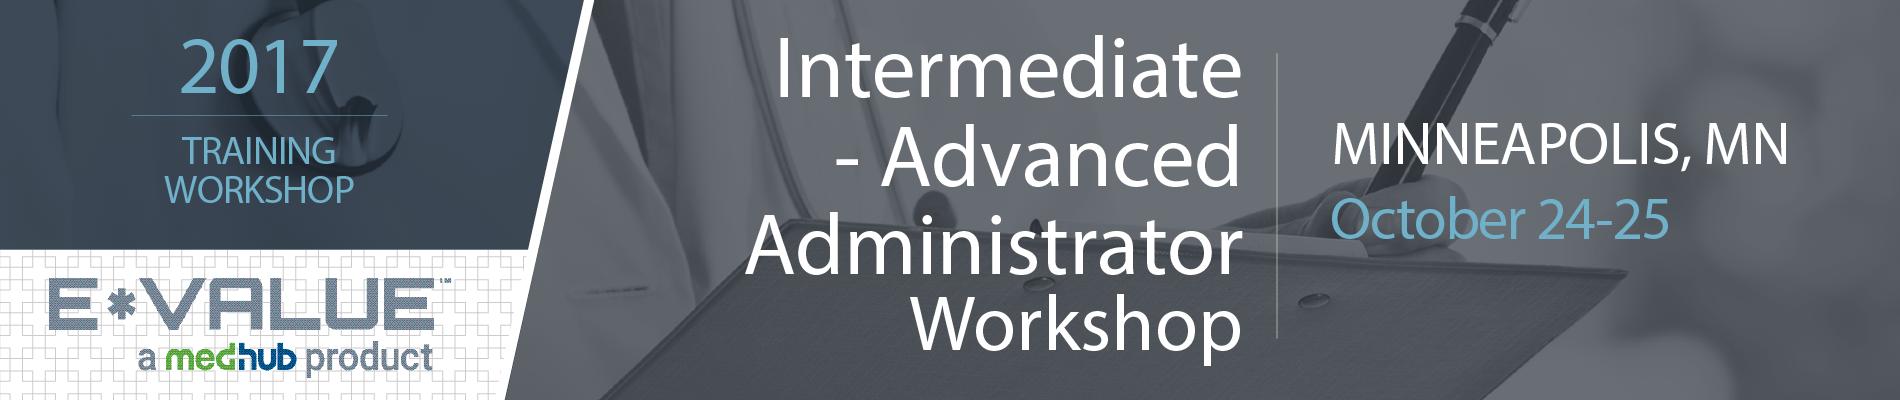 Intermediate/Advanced E*Value Administrator Workshop (October 24-25)